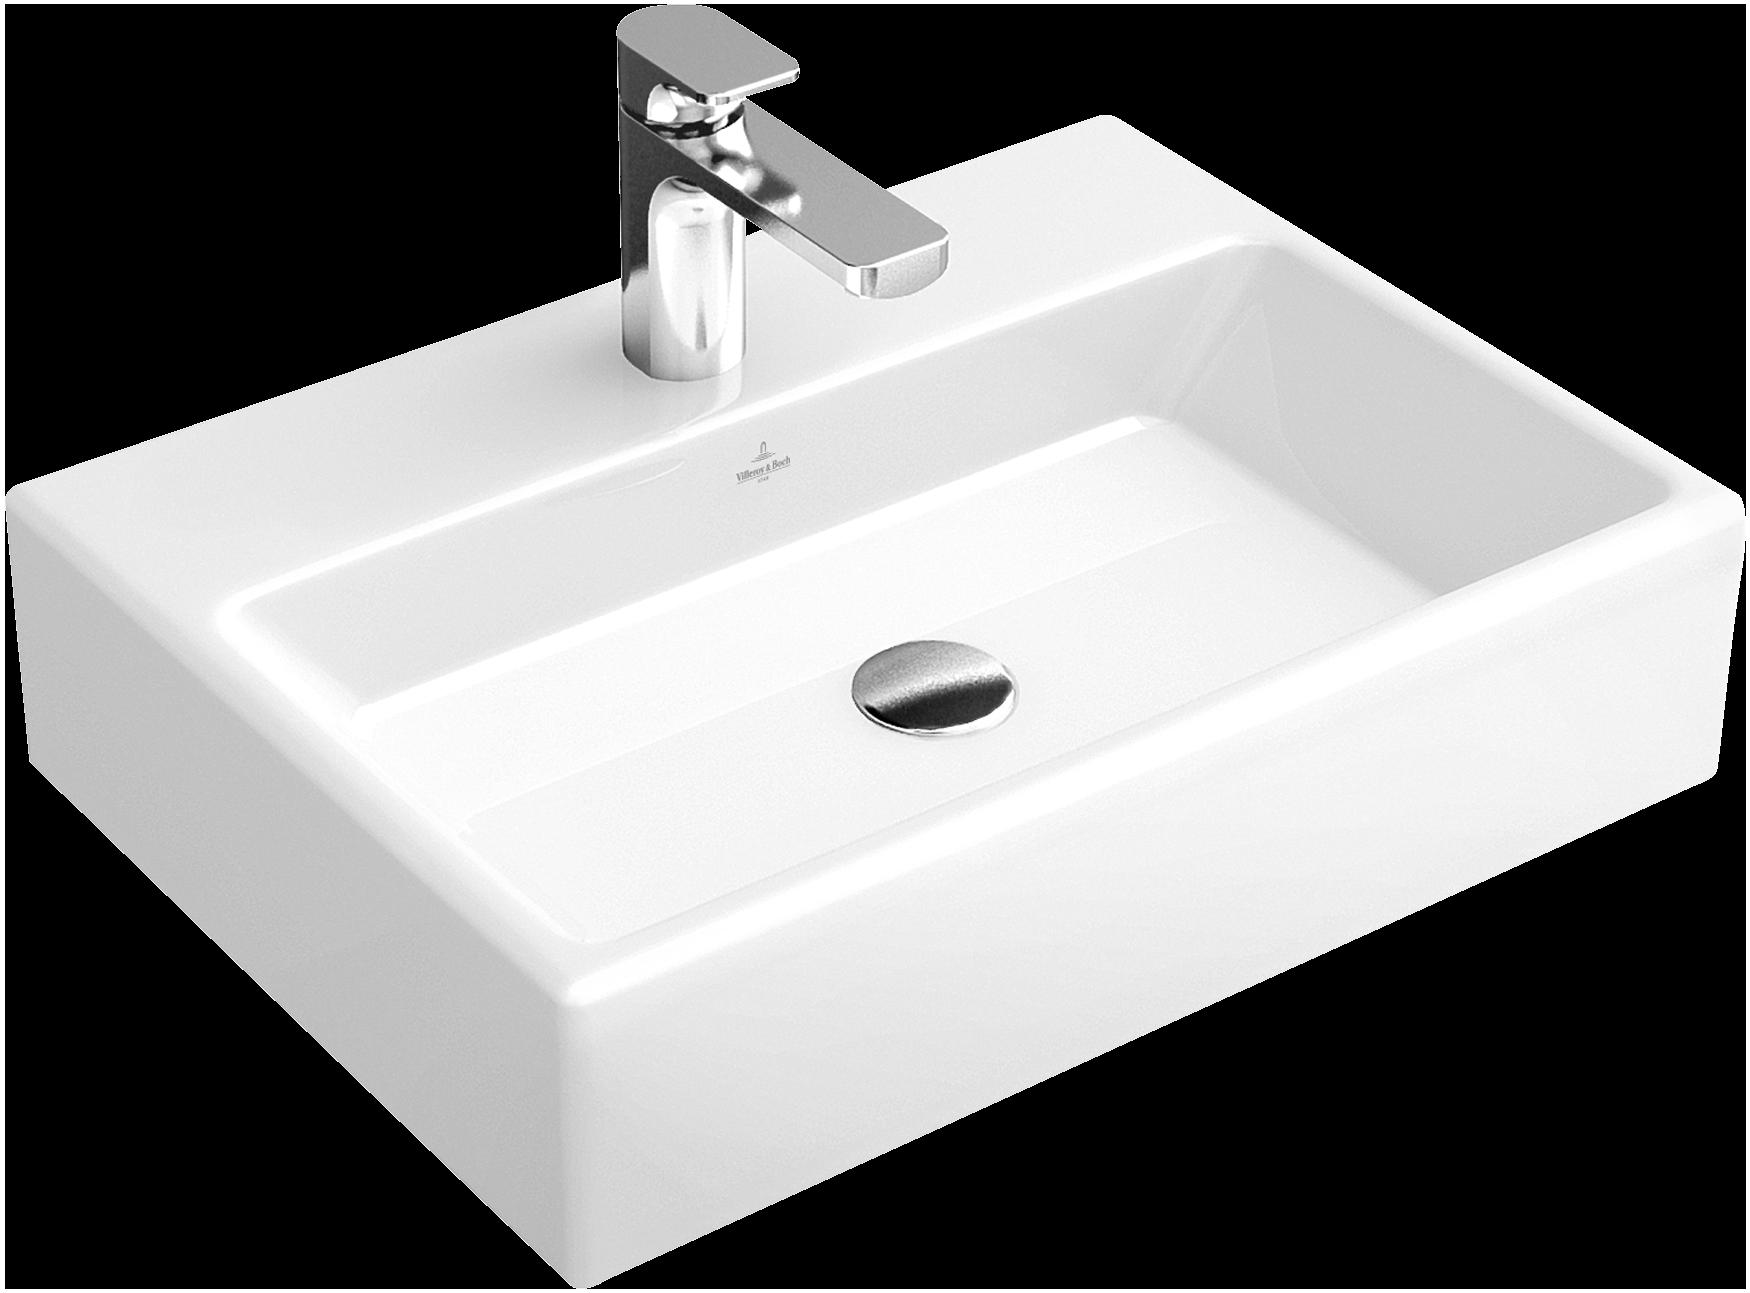 memento washbasin angular 51335f villeroy boch. Black Bedroom Furniture Sets. Home Design Ideas